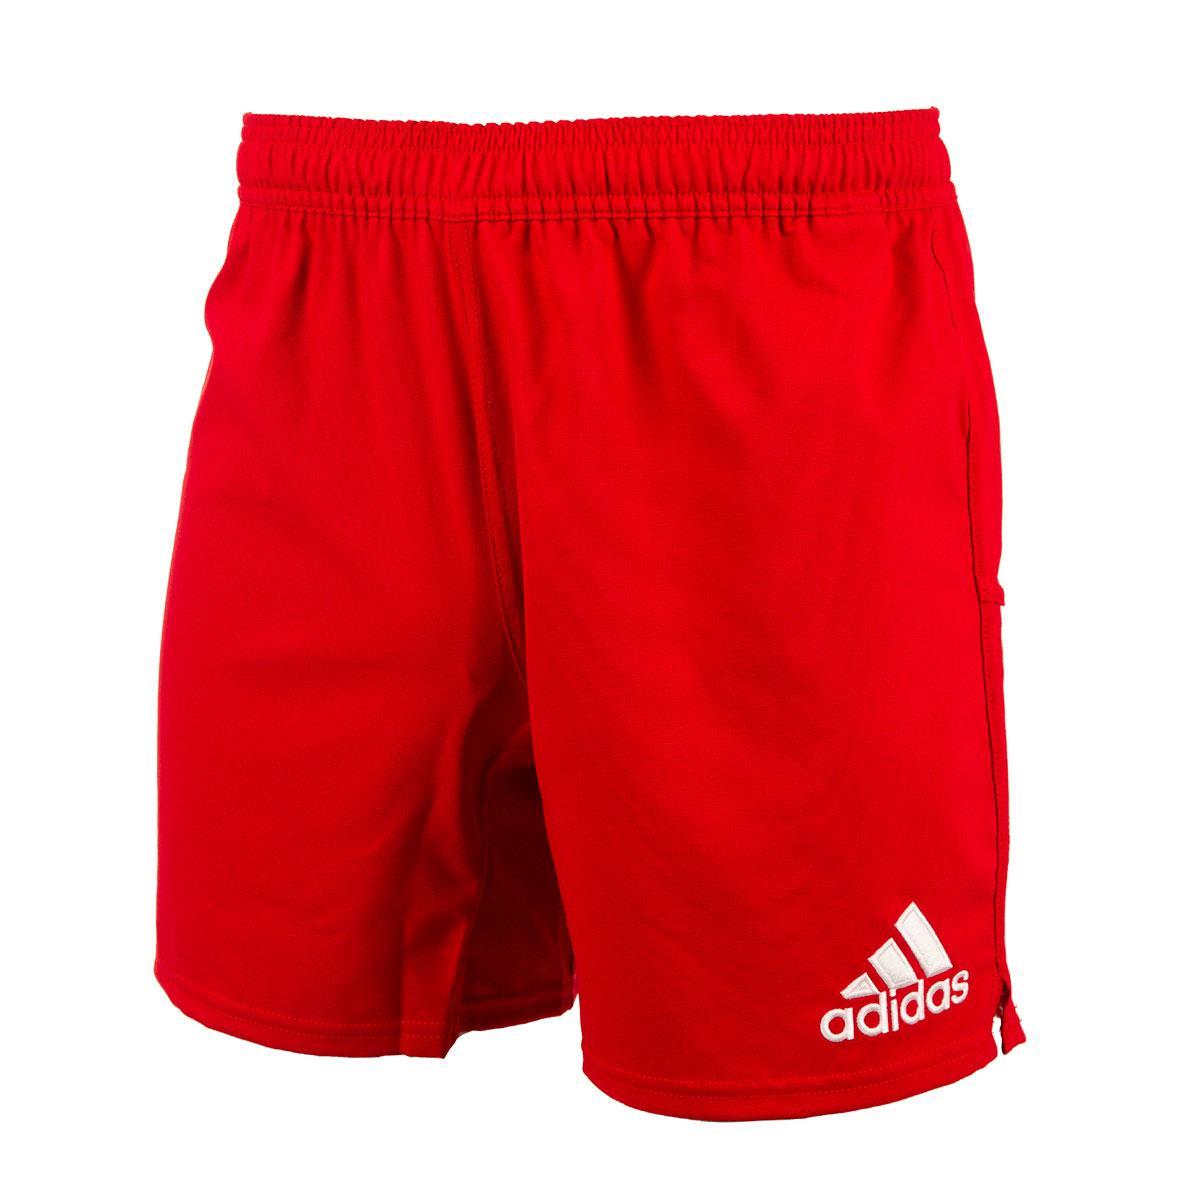 0757f8b859 Mens Red adidas 3 Stripe Rugby Shorts | rugbystore